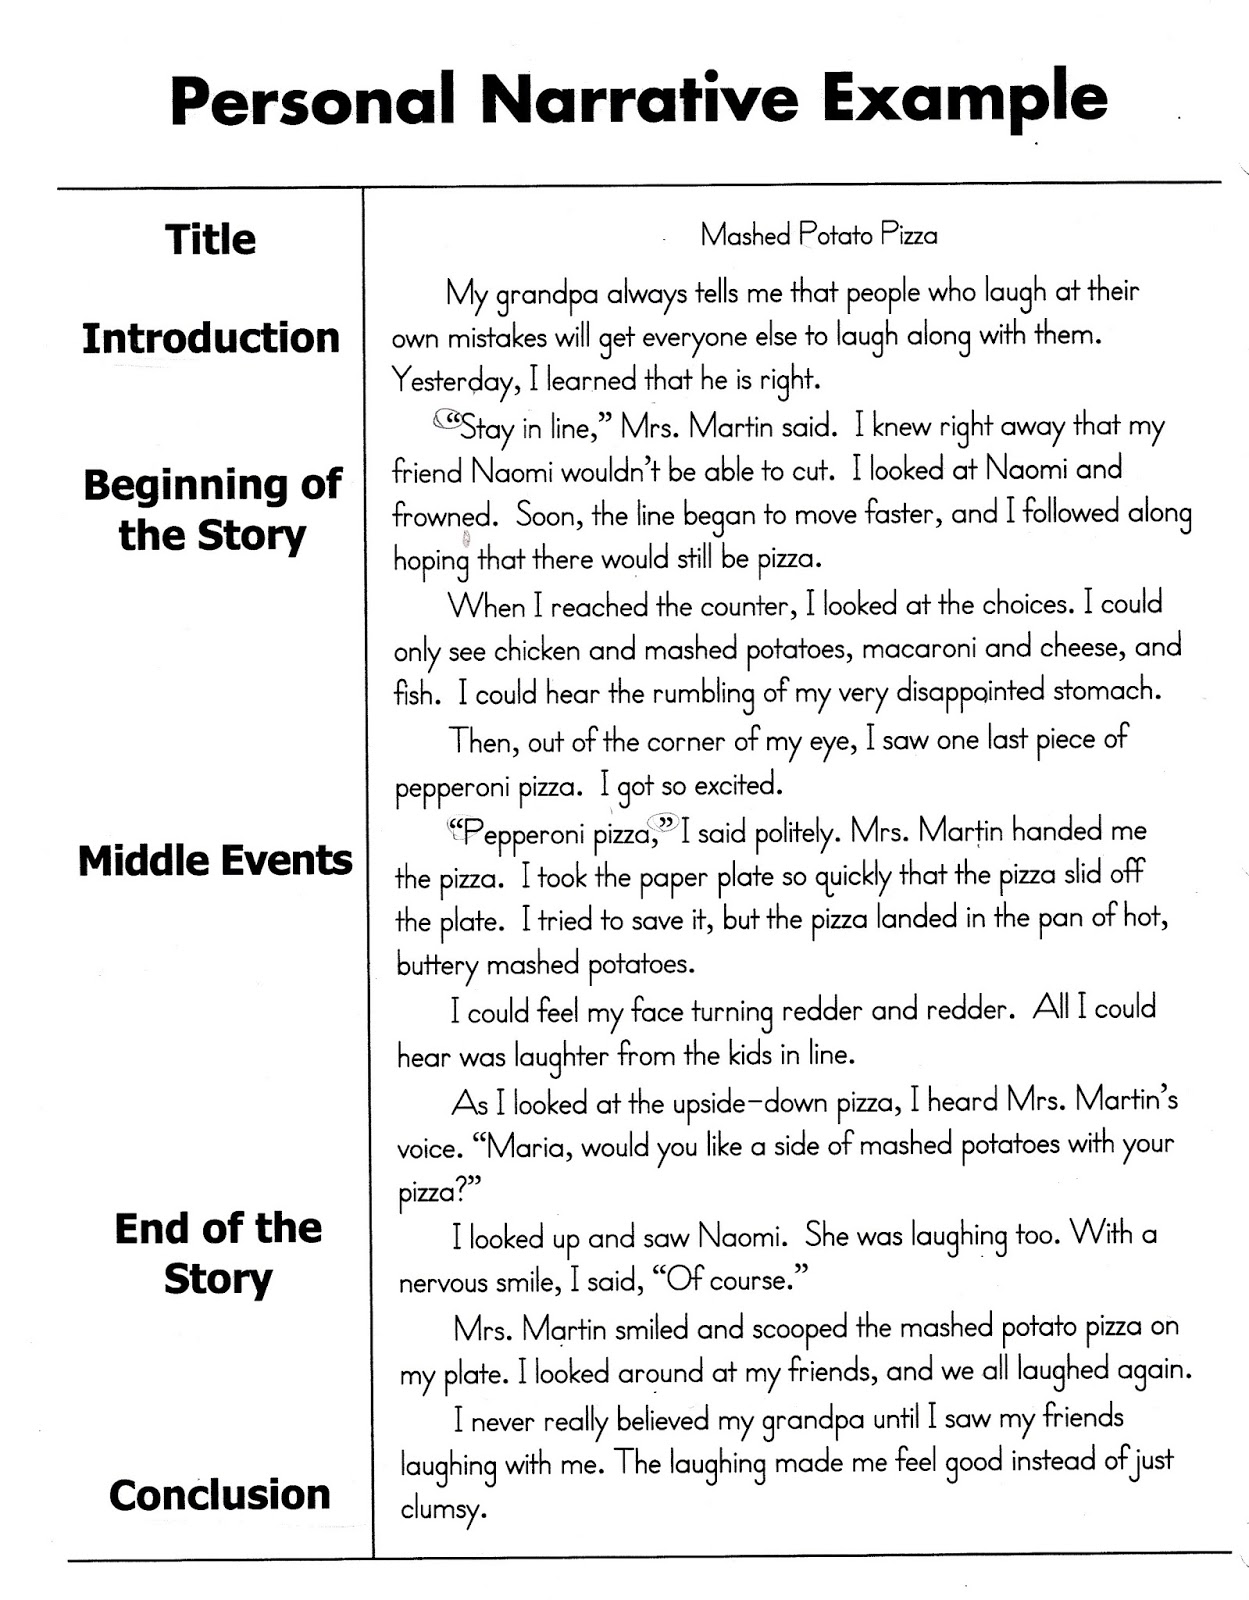 013 Essay Example Personal20narrative Narrative Unforgettable Samples Examples High School Format Interesting Spm Full